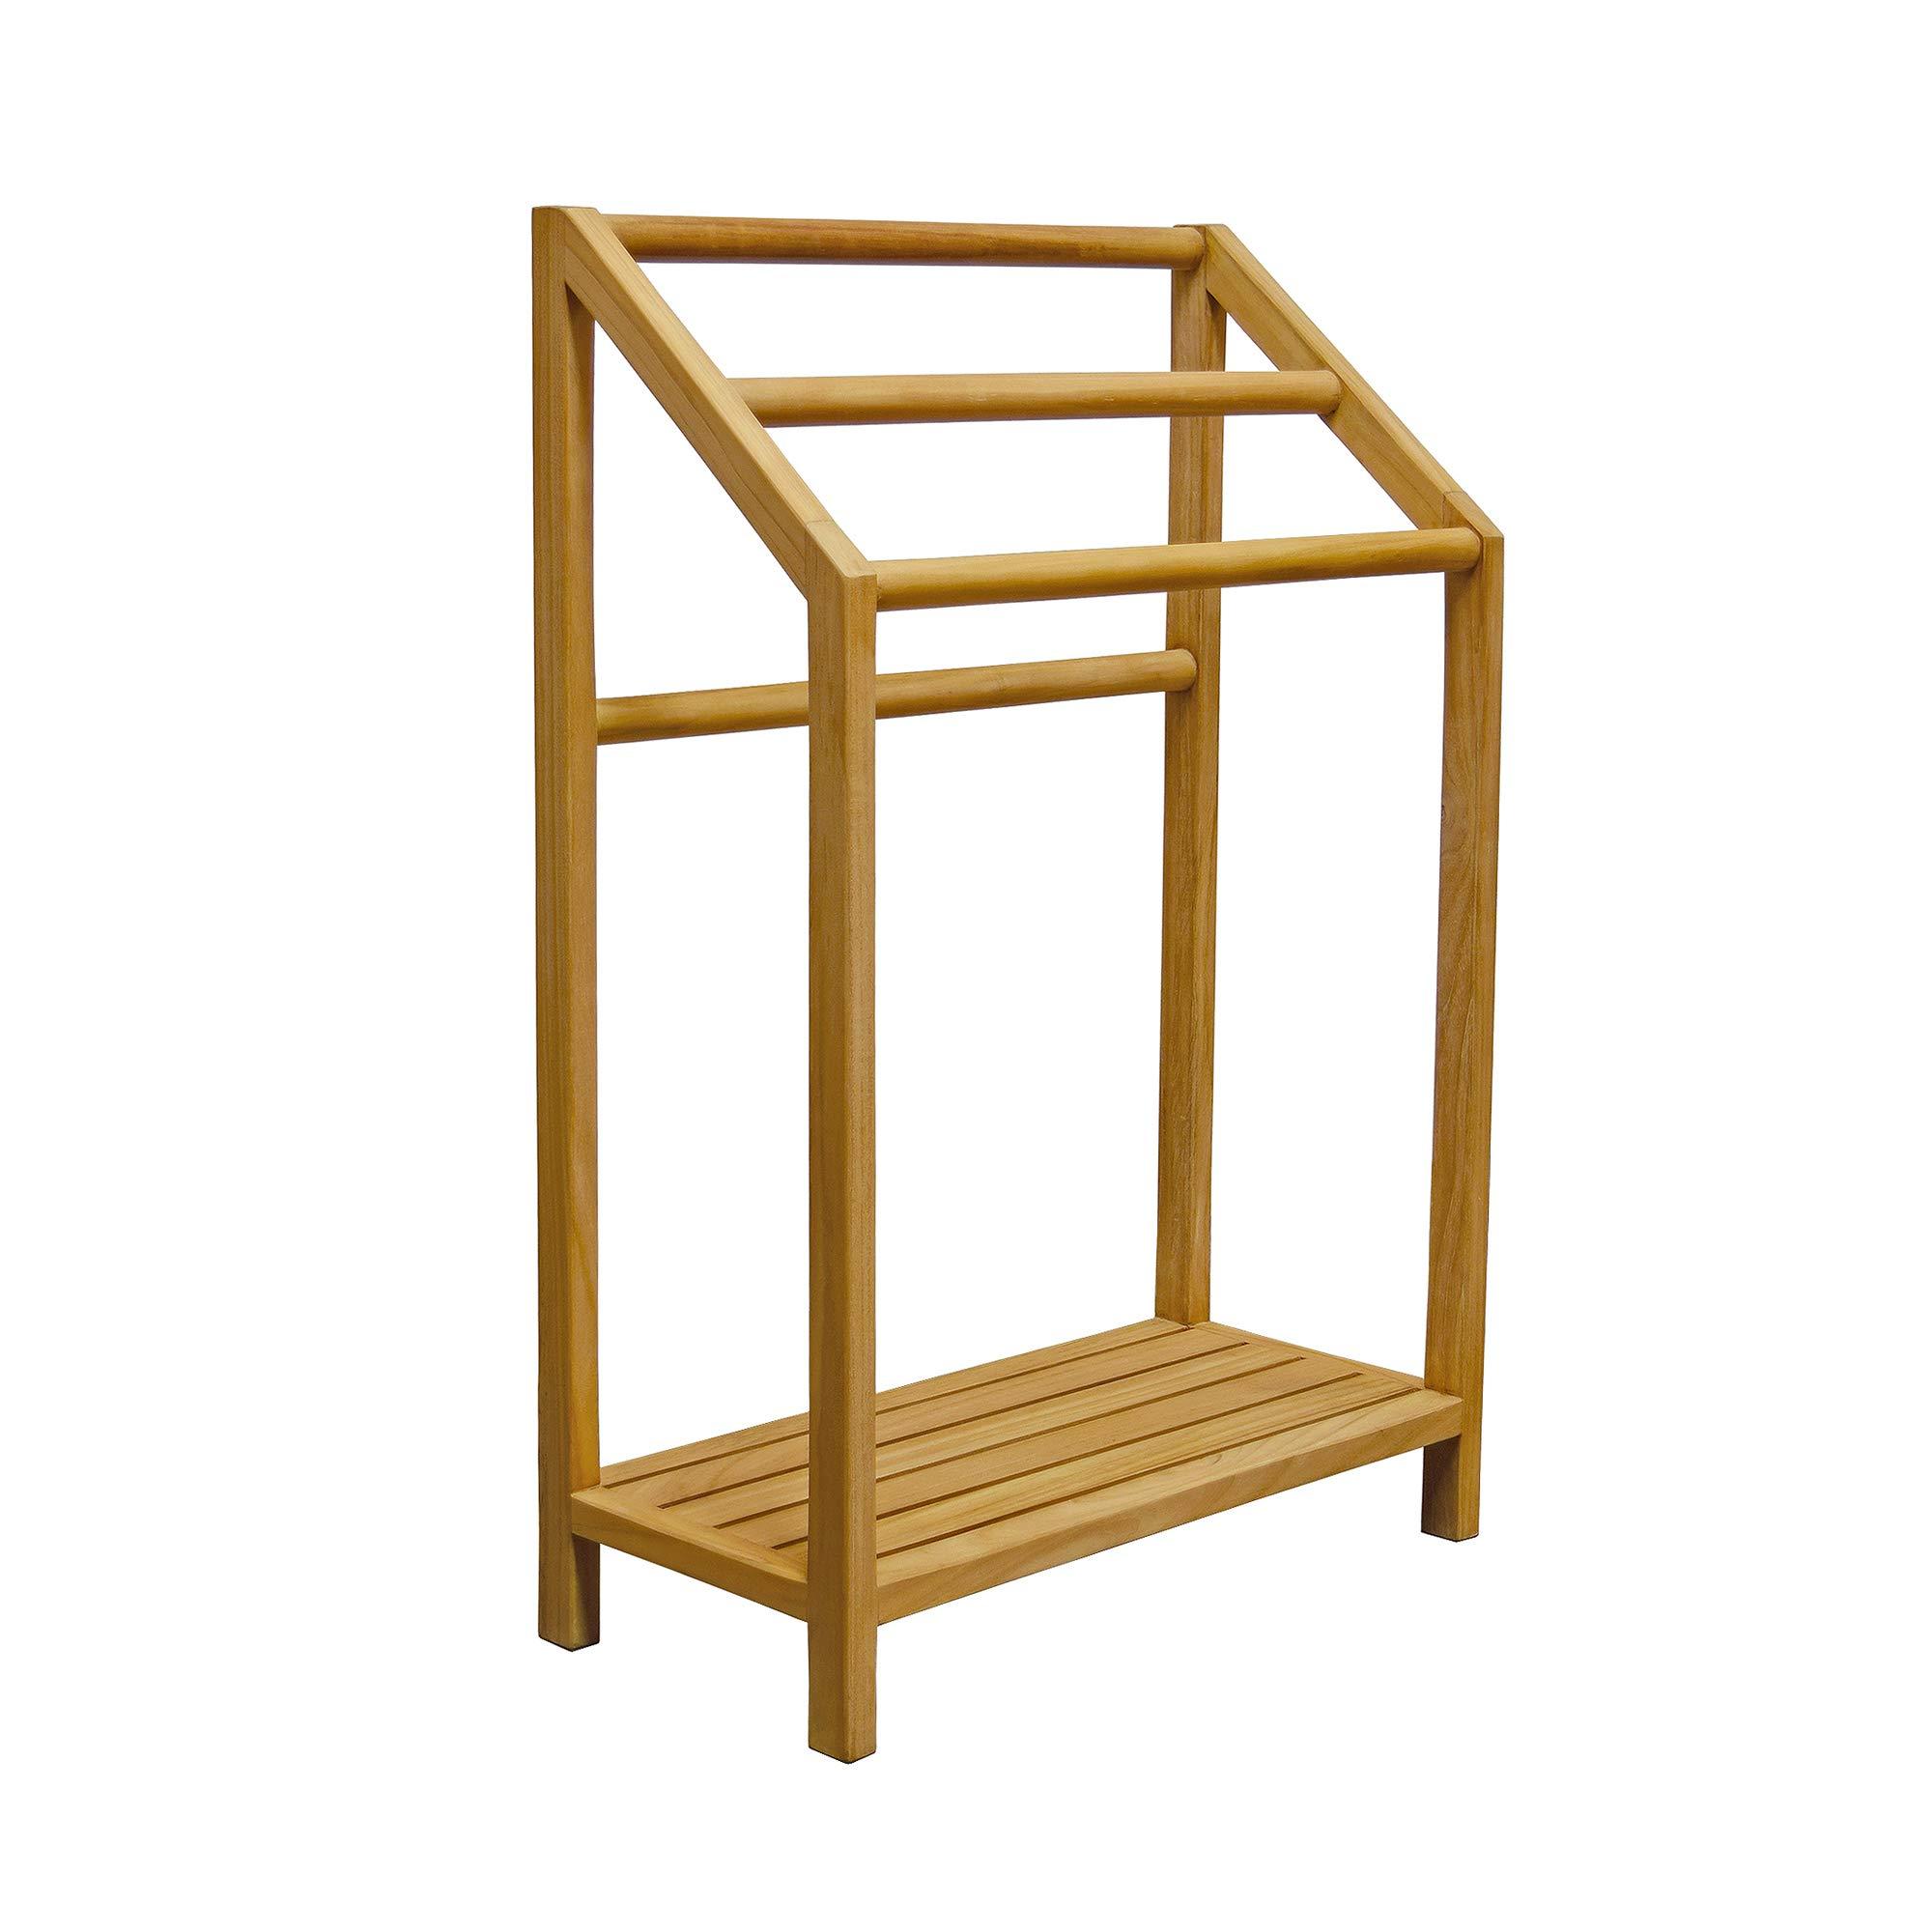 Asta Spa Teak Freestanding Towel Rack, 3-Bar with Shelf